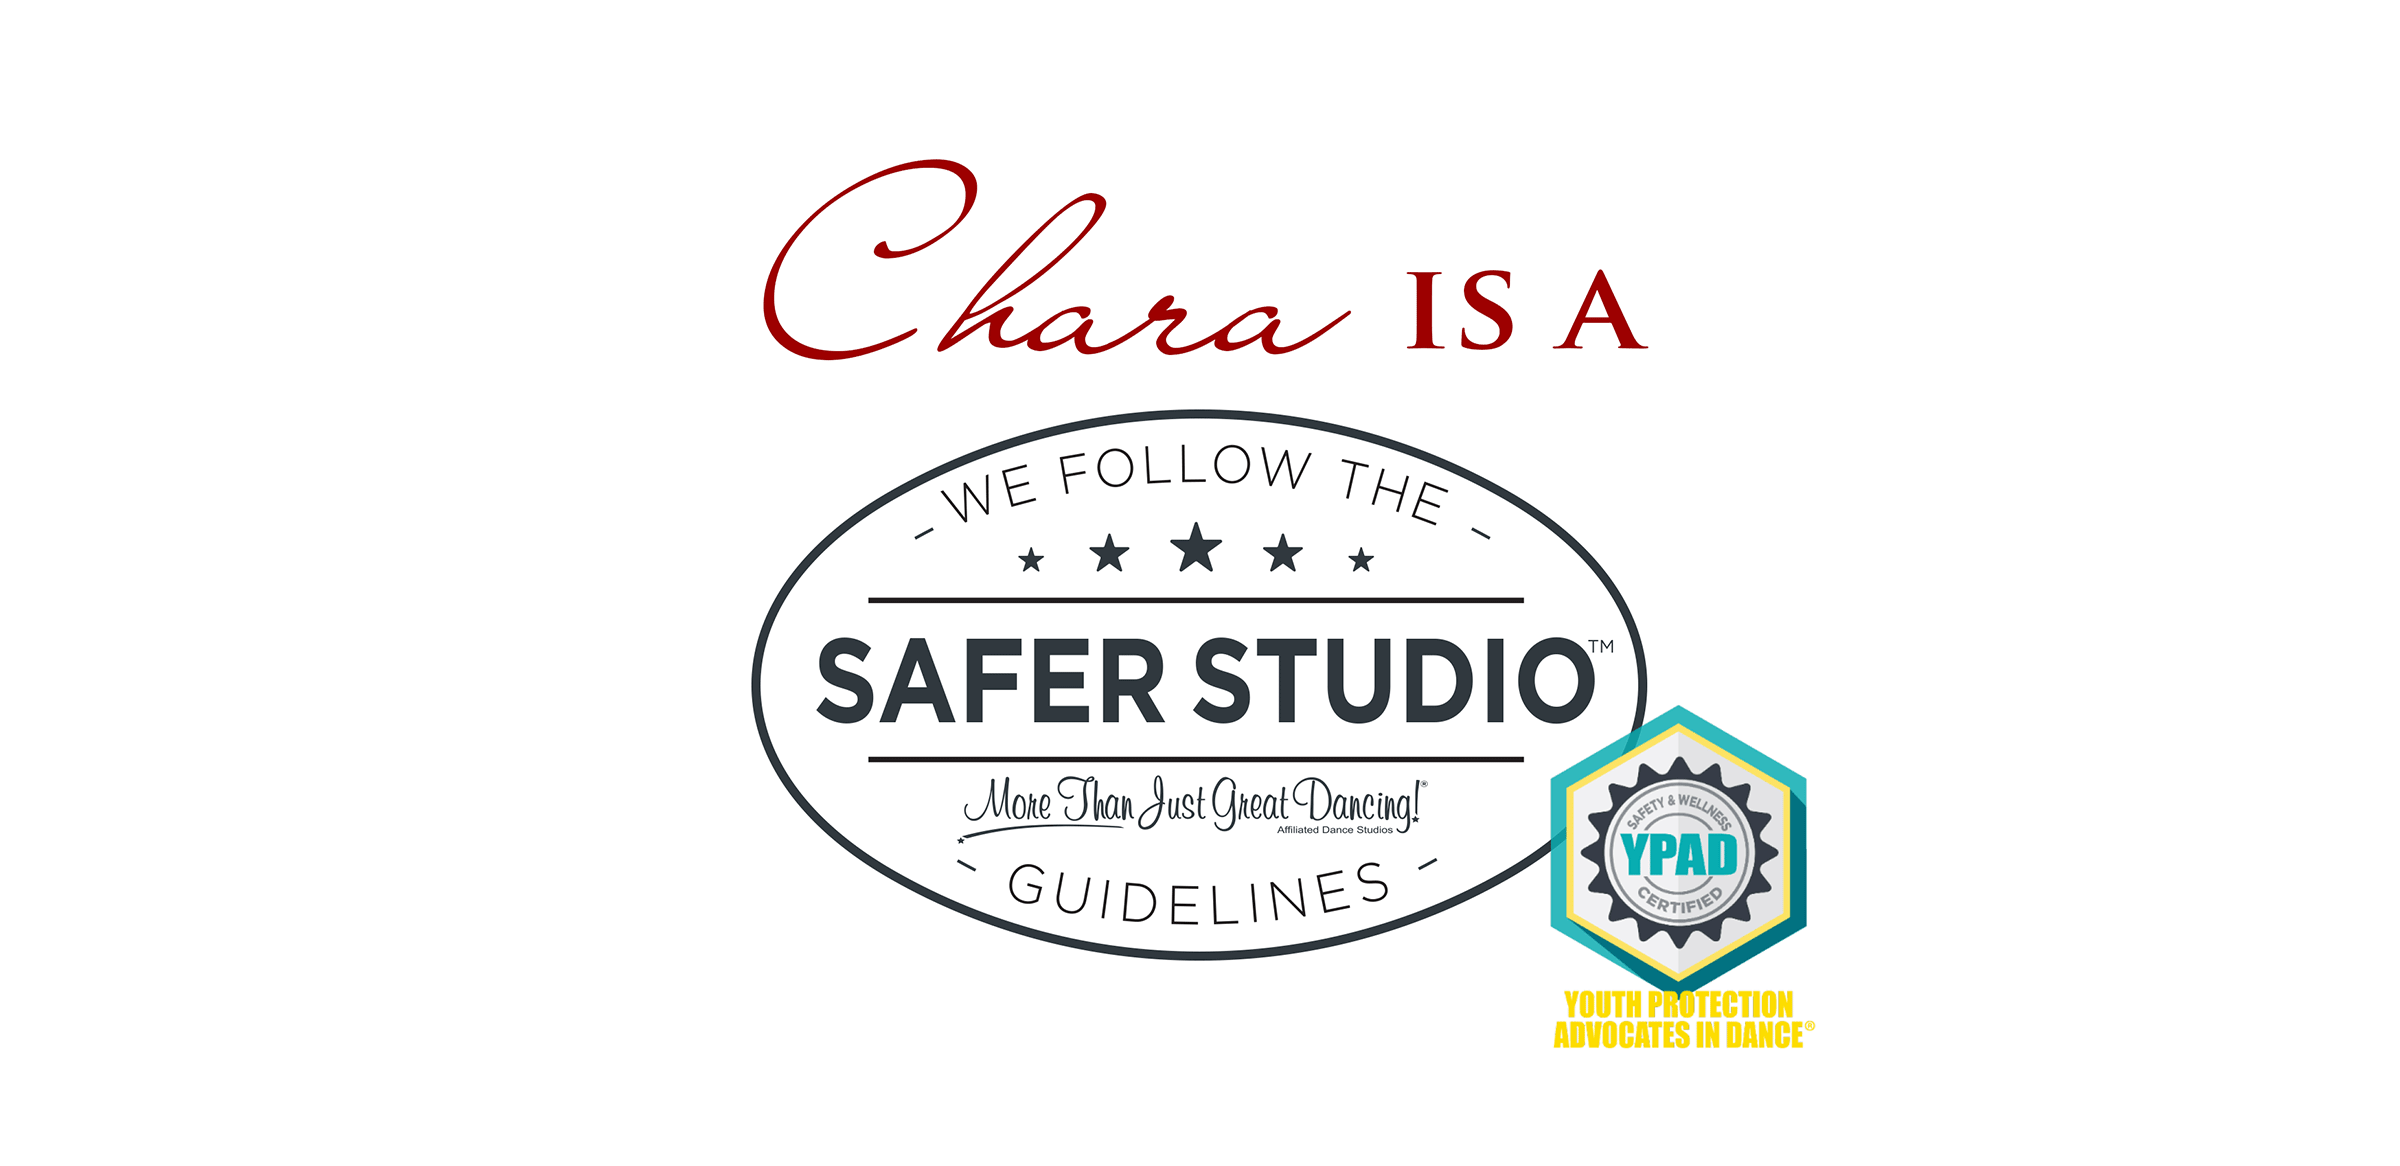 Safer Studio